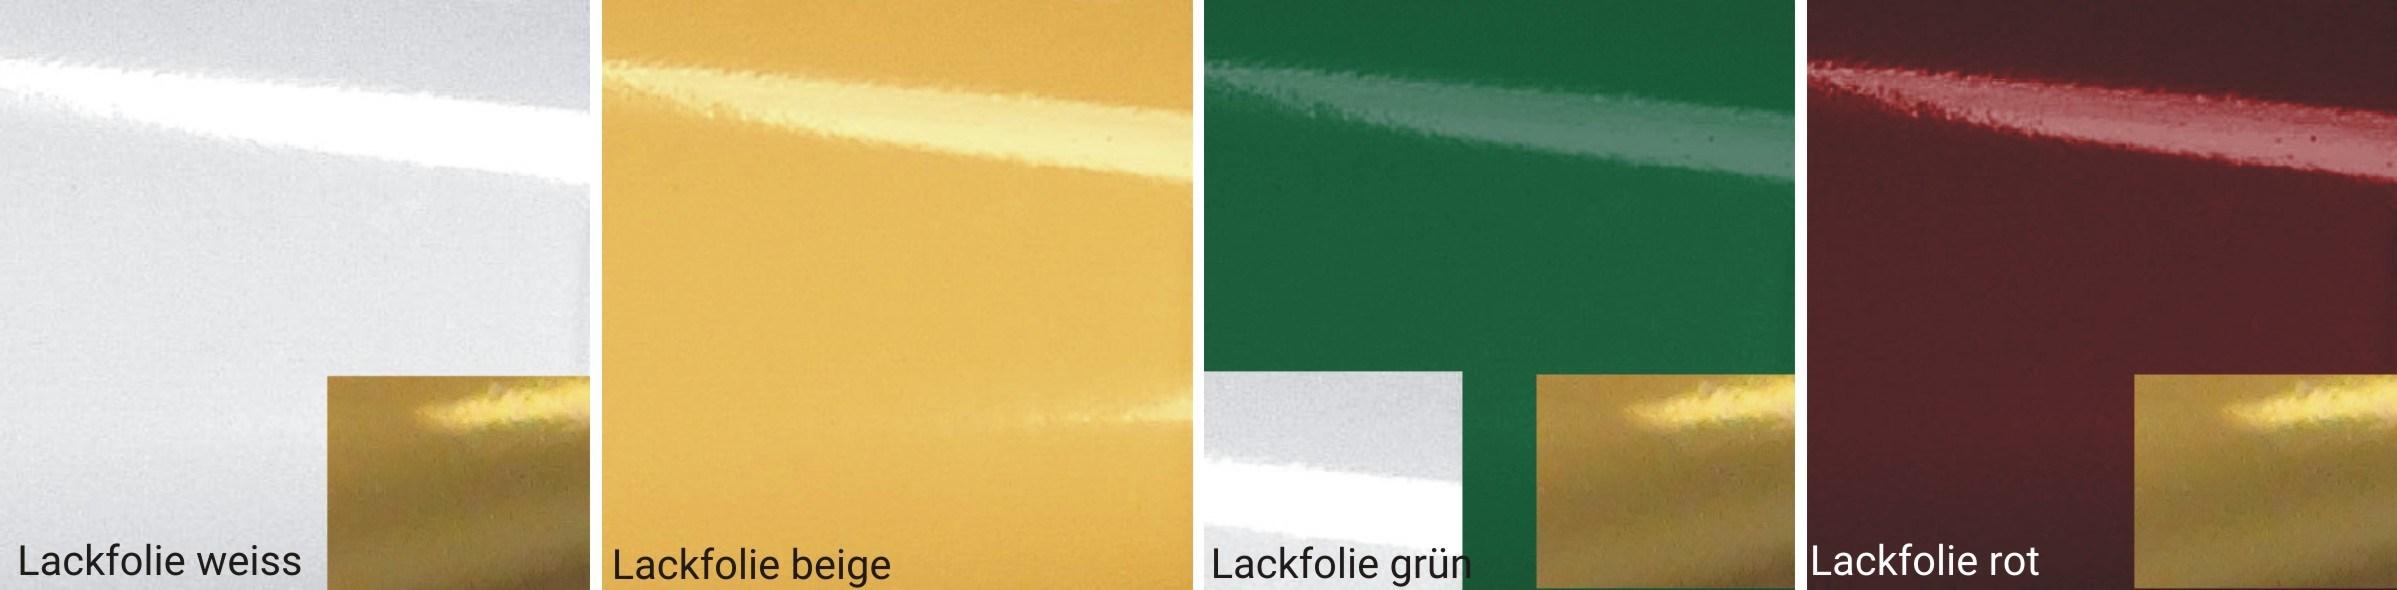 Lackfolie-balken-1